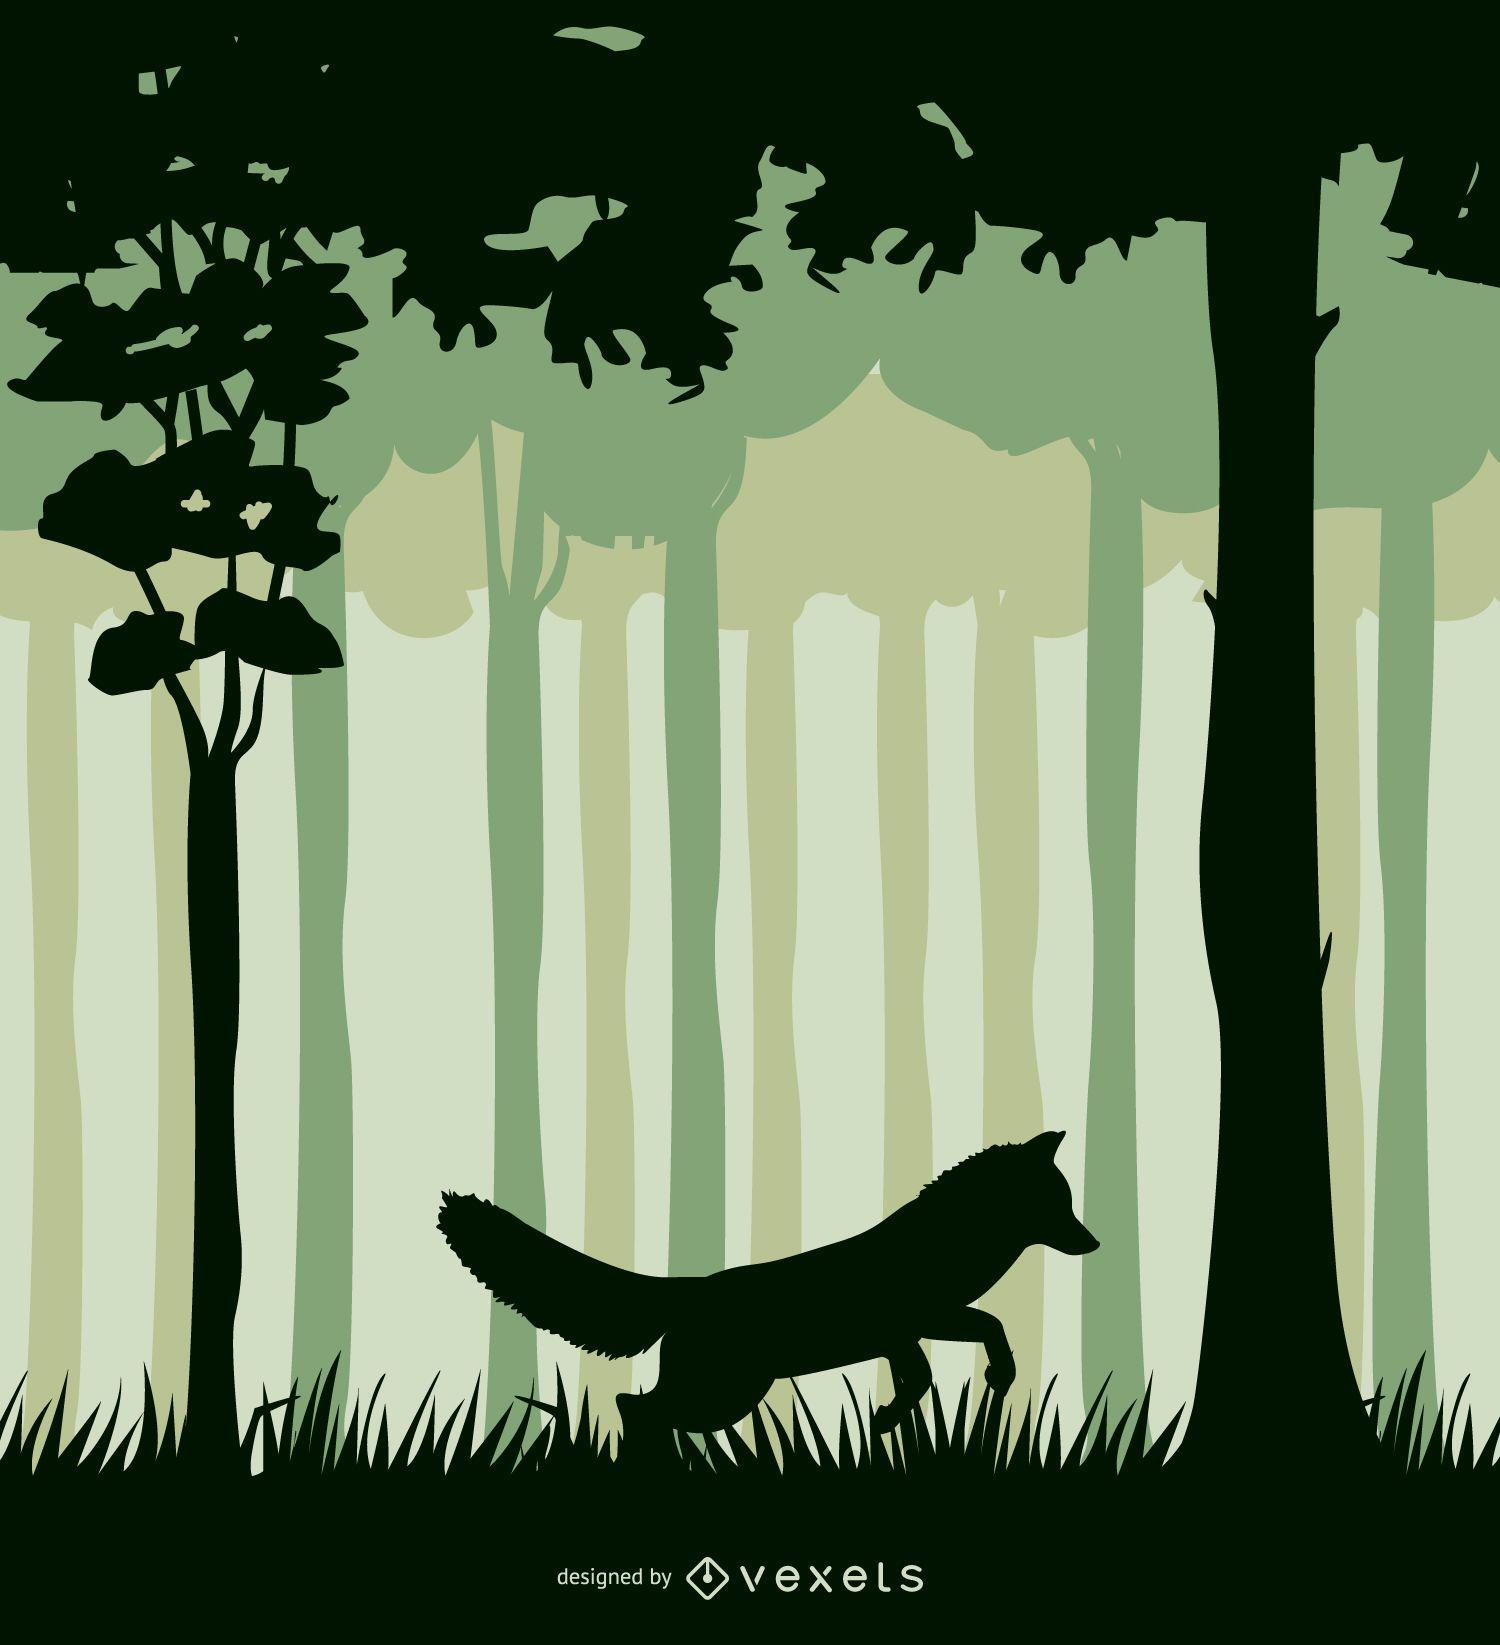 Fox en un paisaje forestal